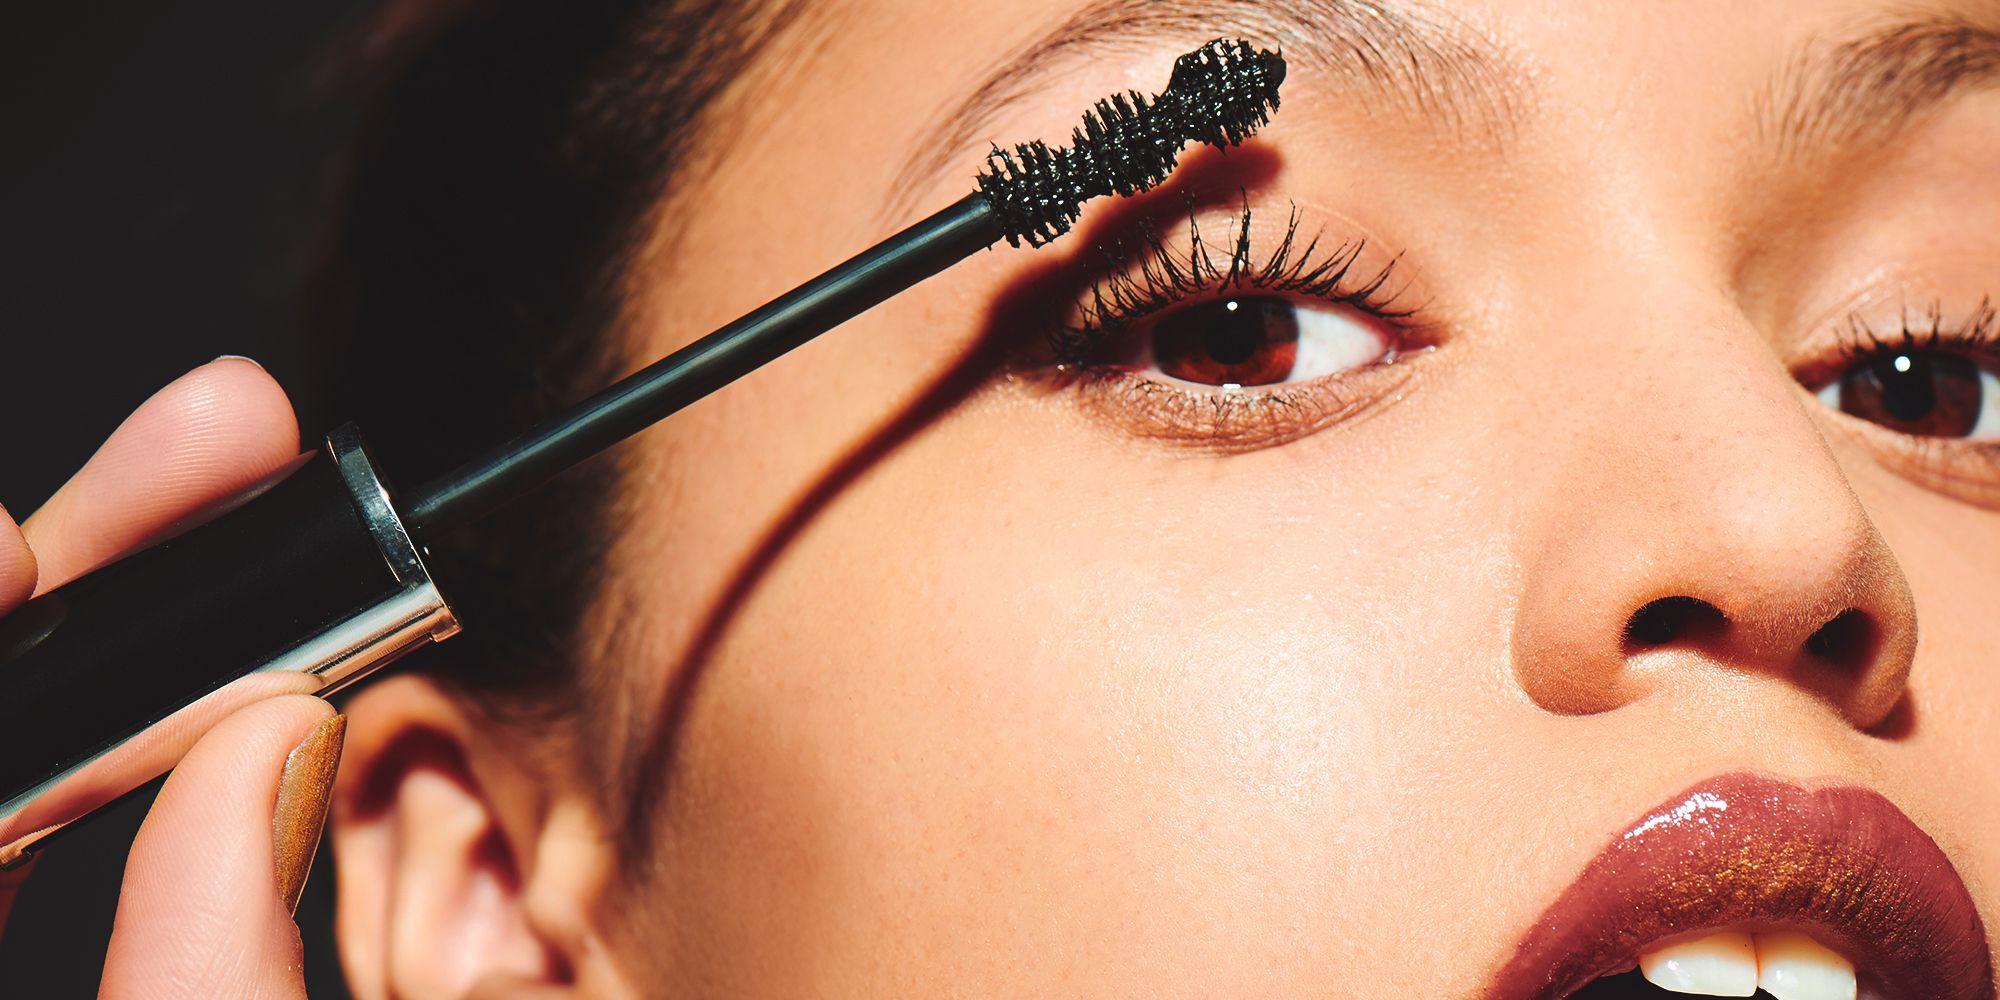 Best Drugstore Mascara Picks Elle Editors Pick Their Favorite